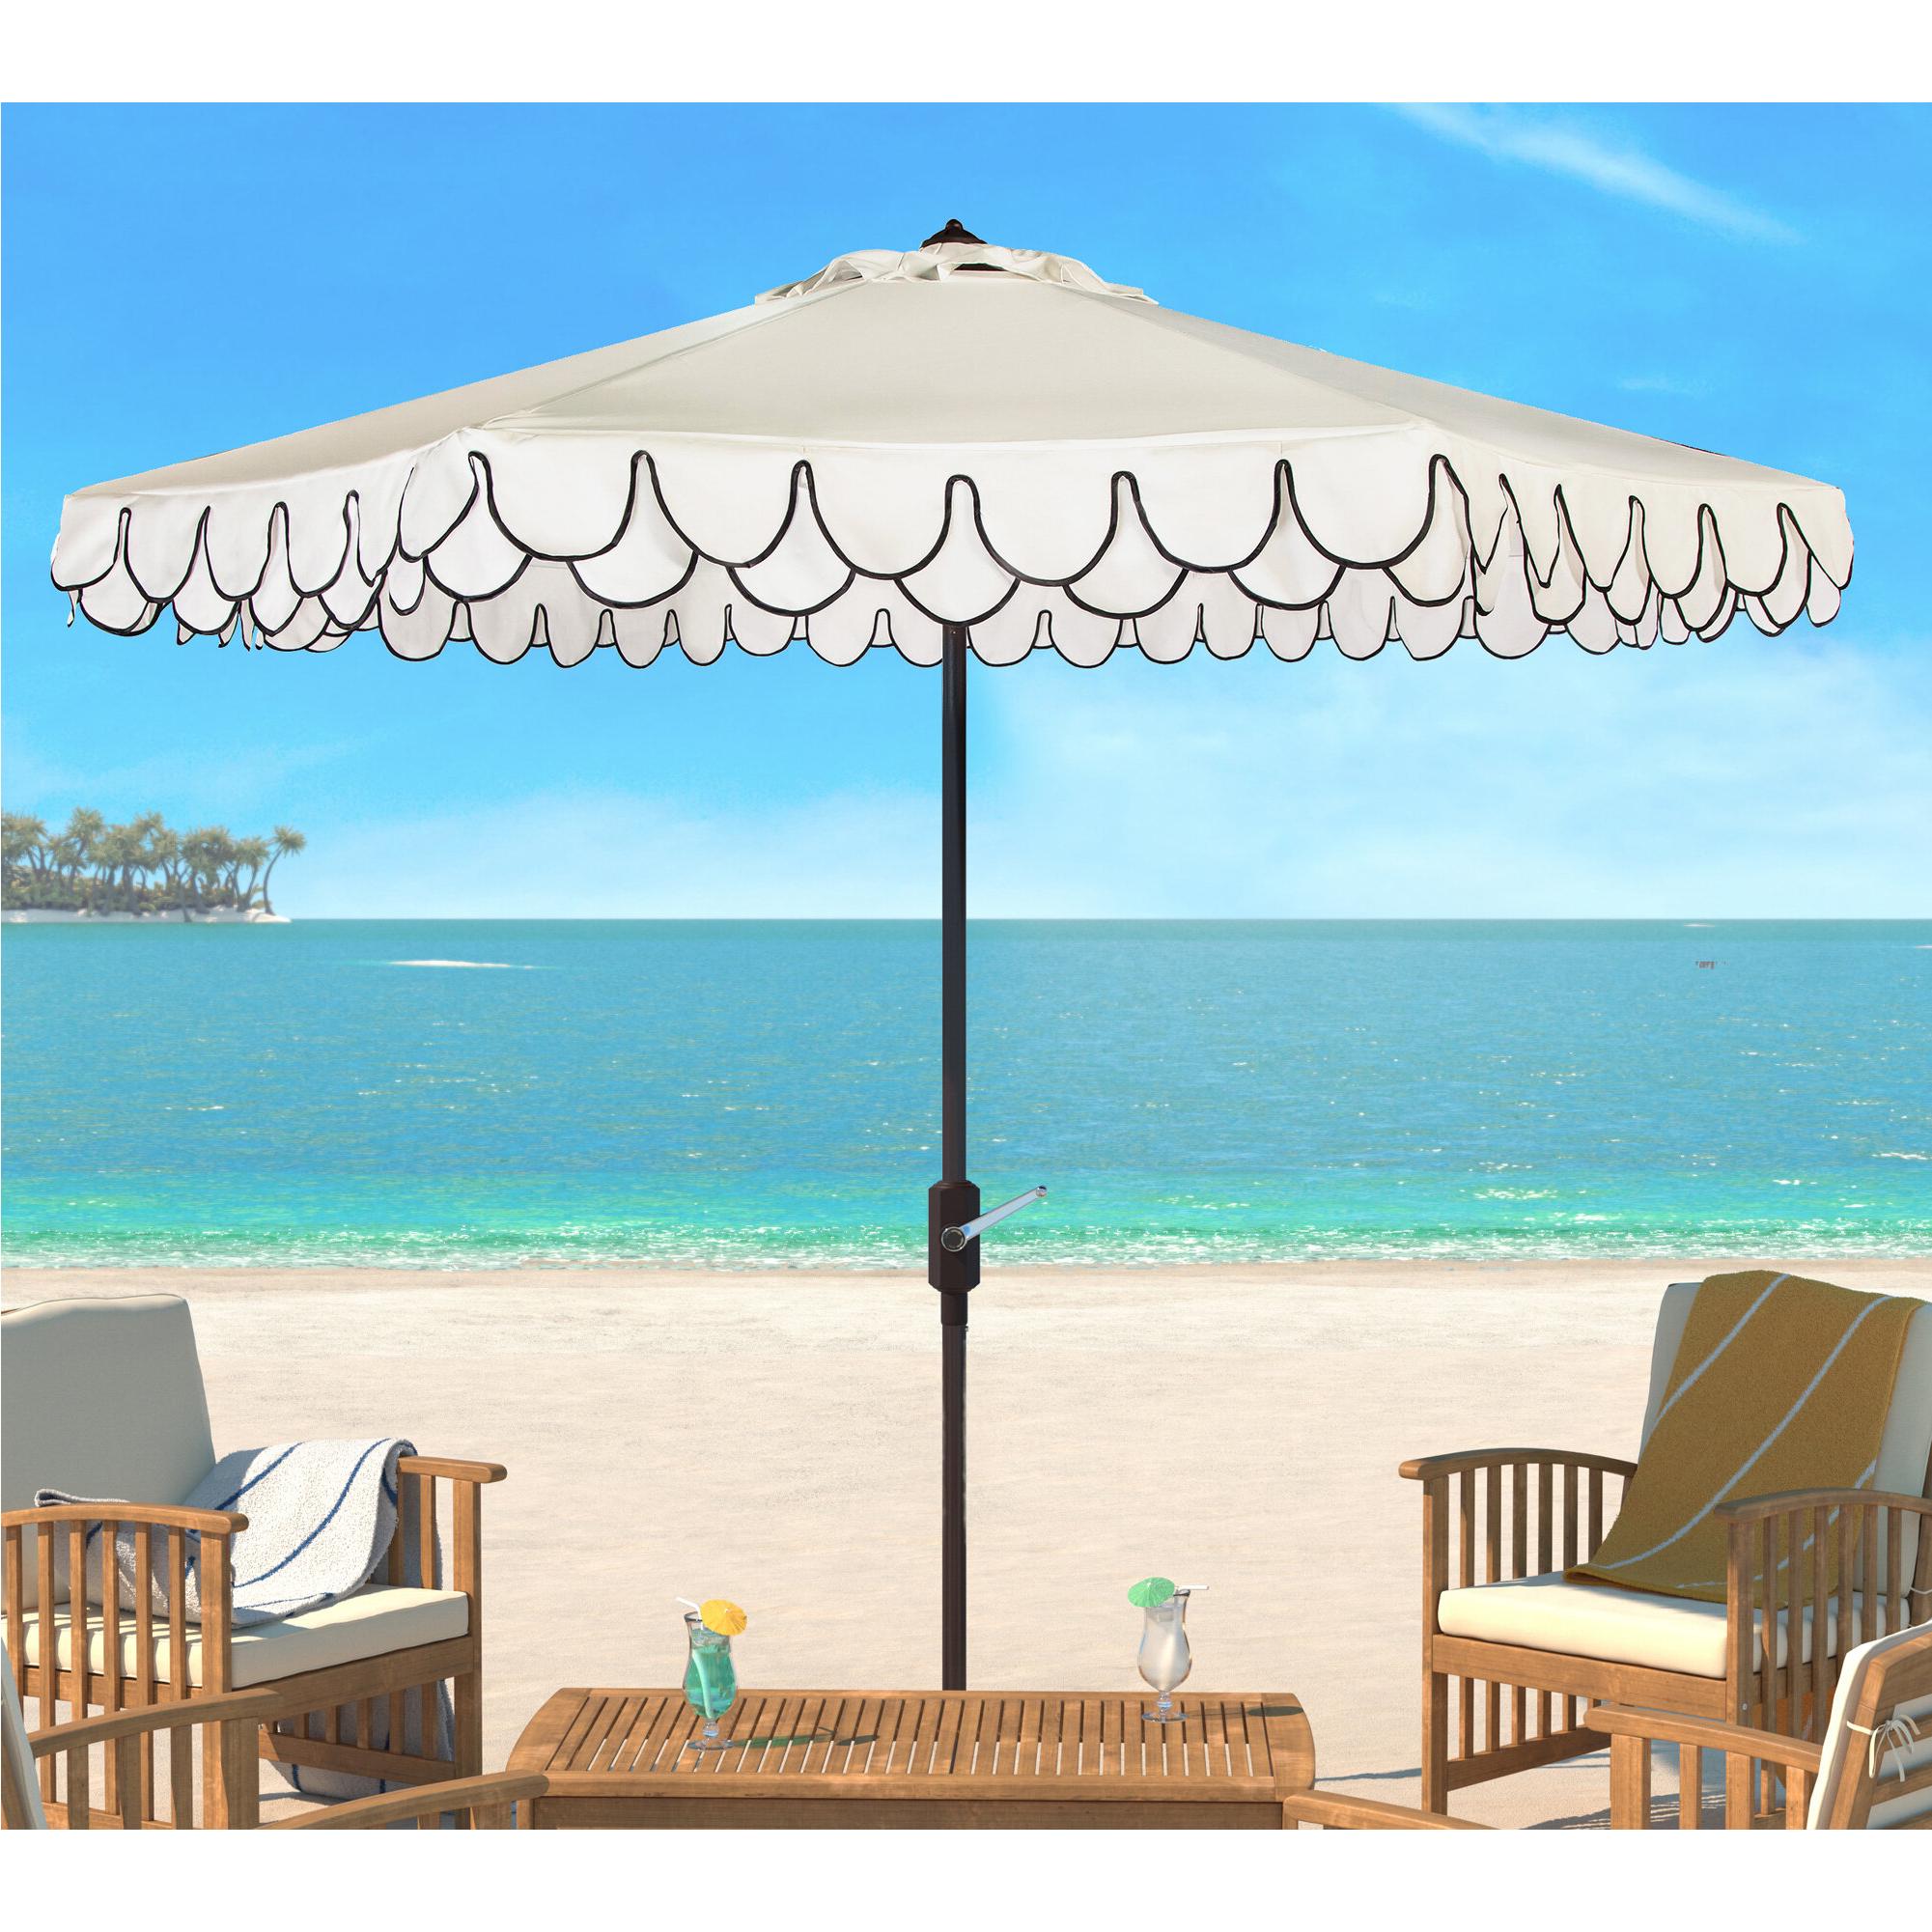 Lark Manor Artrip 9' Market Umbrella Intended For Well Known Artrip Market Umbrellas (View 3 of 20)